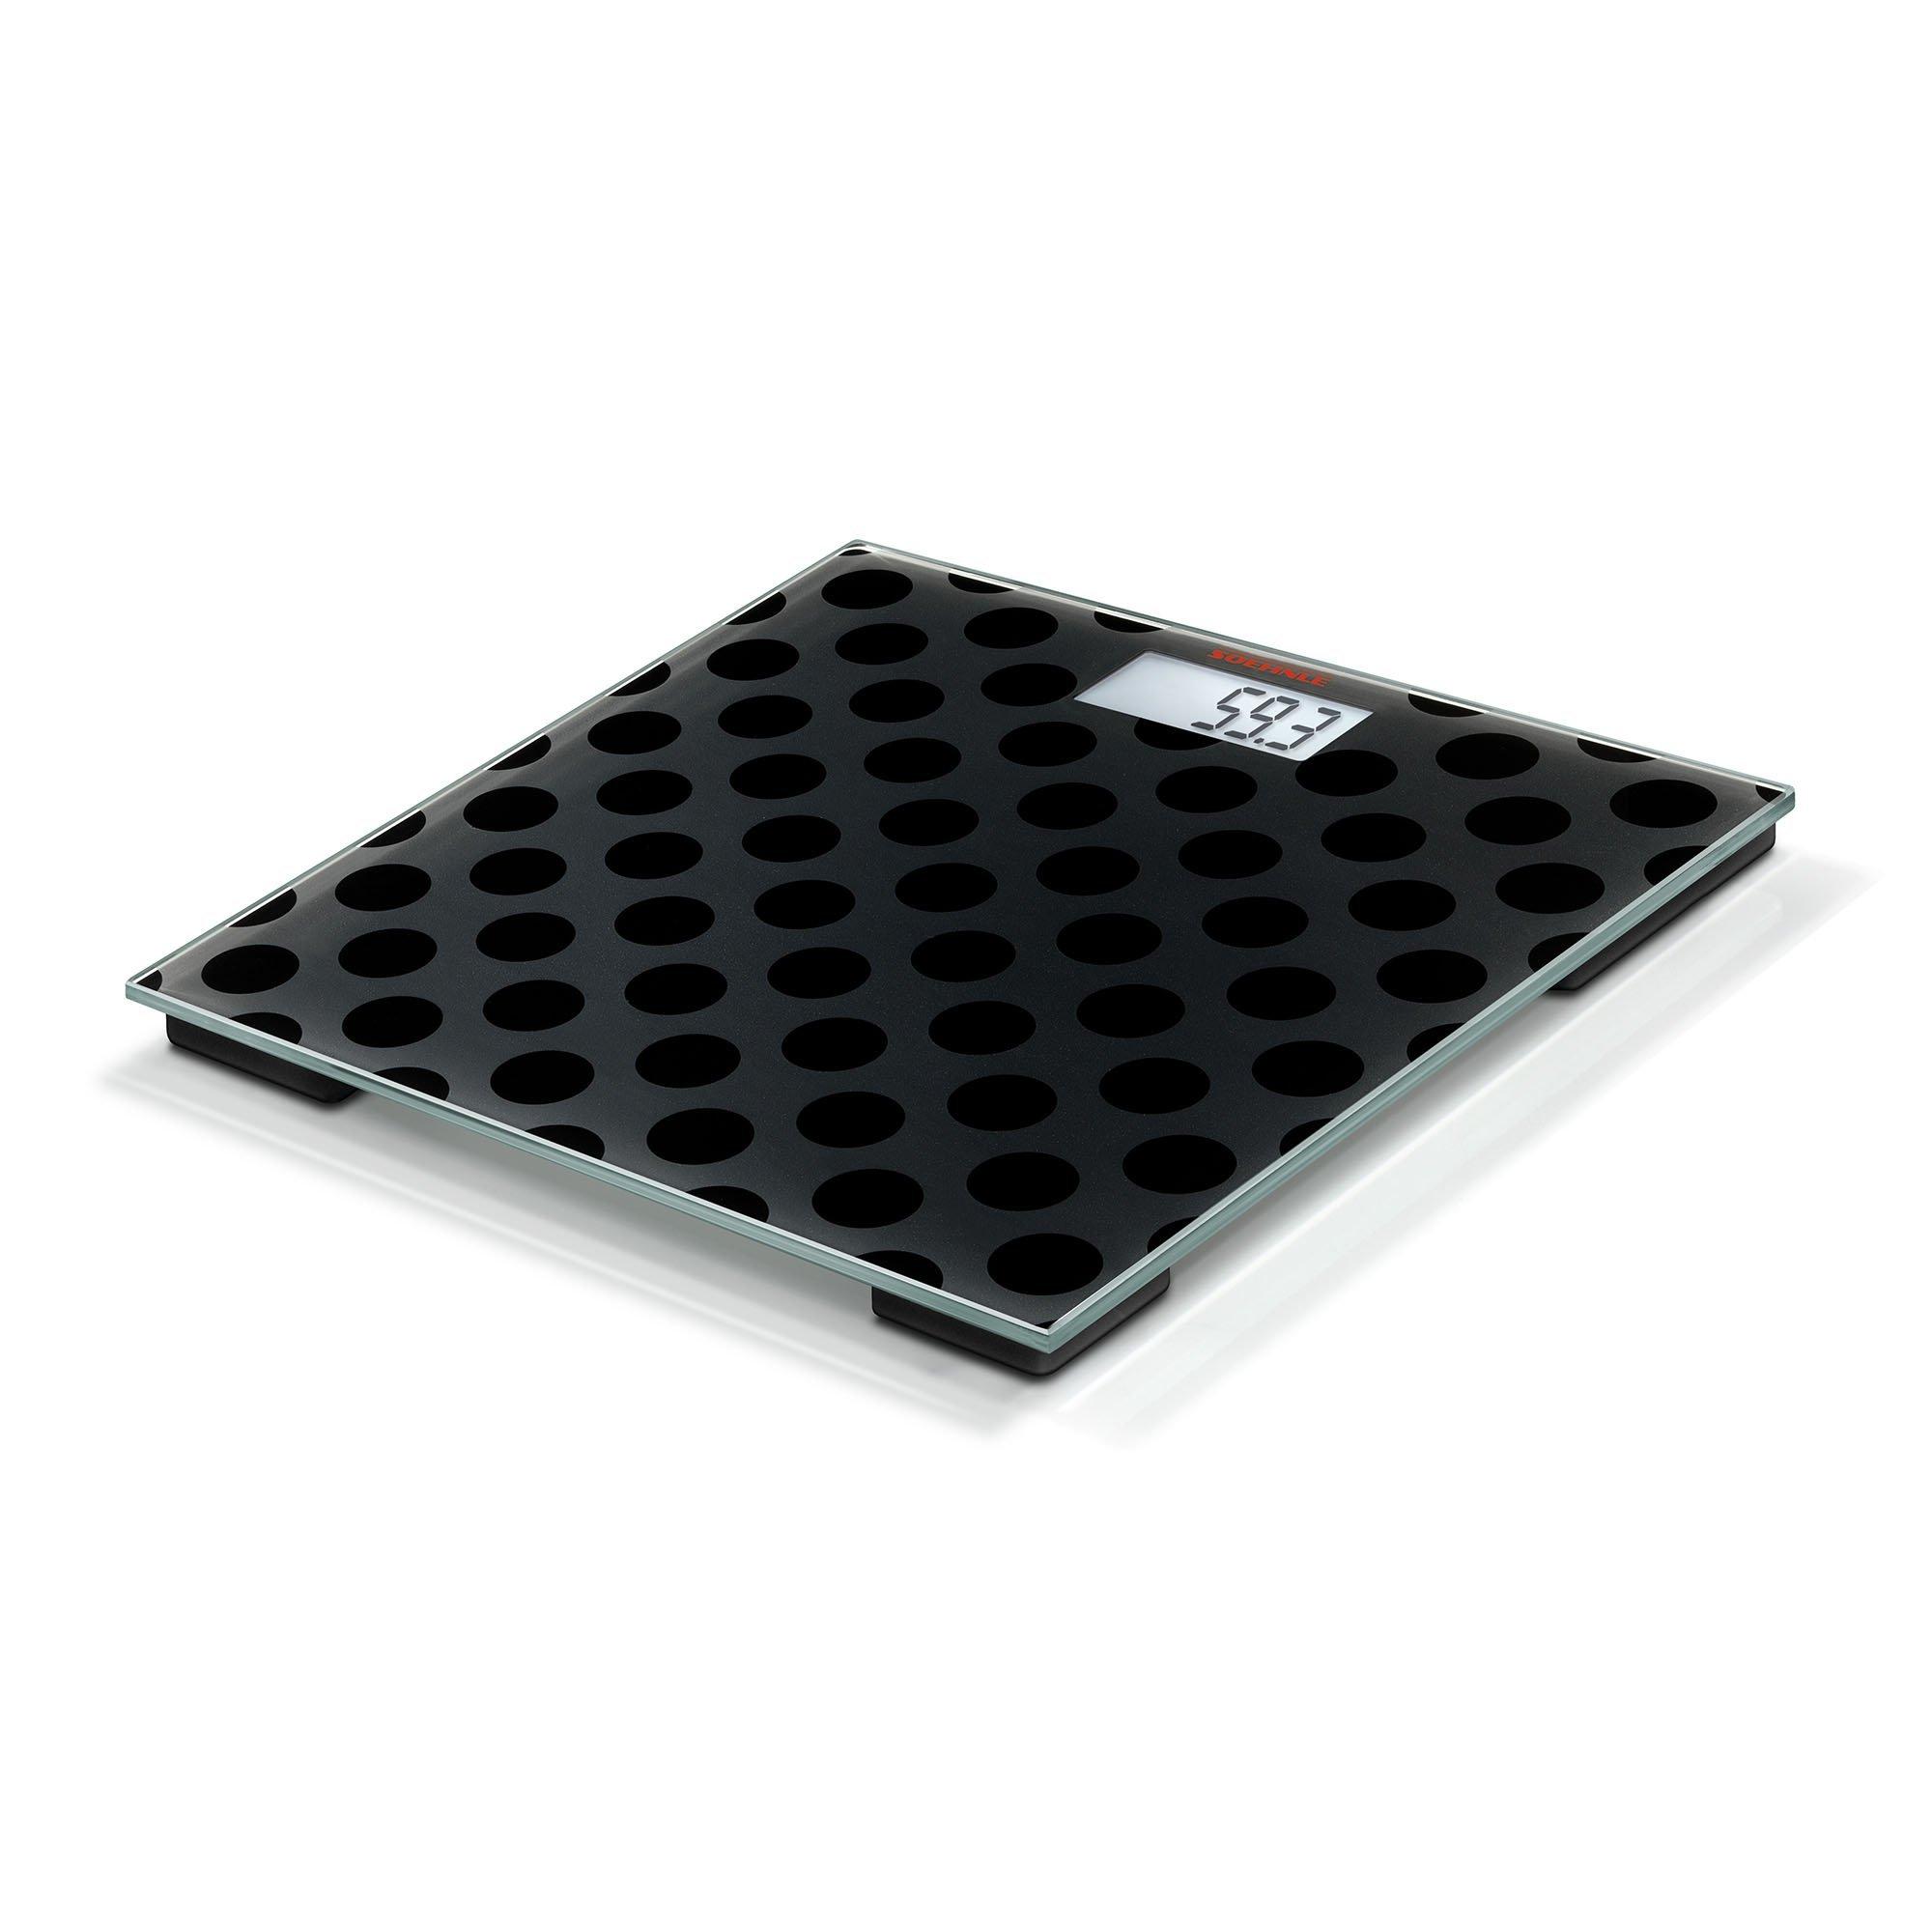 Soehnle Maya Digital black Edition Personal Glass Bathroom Scale, Circles by Soehnle (Image #1)